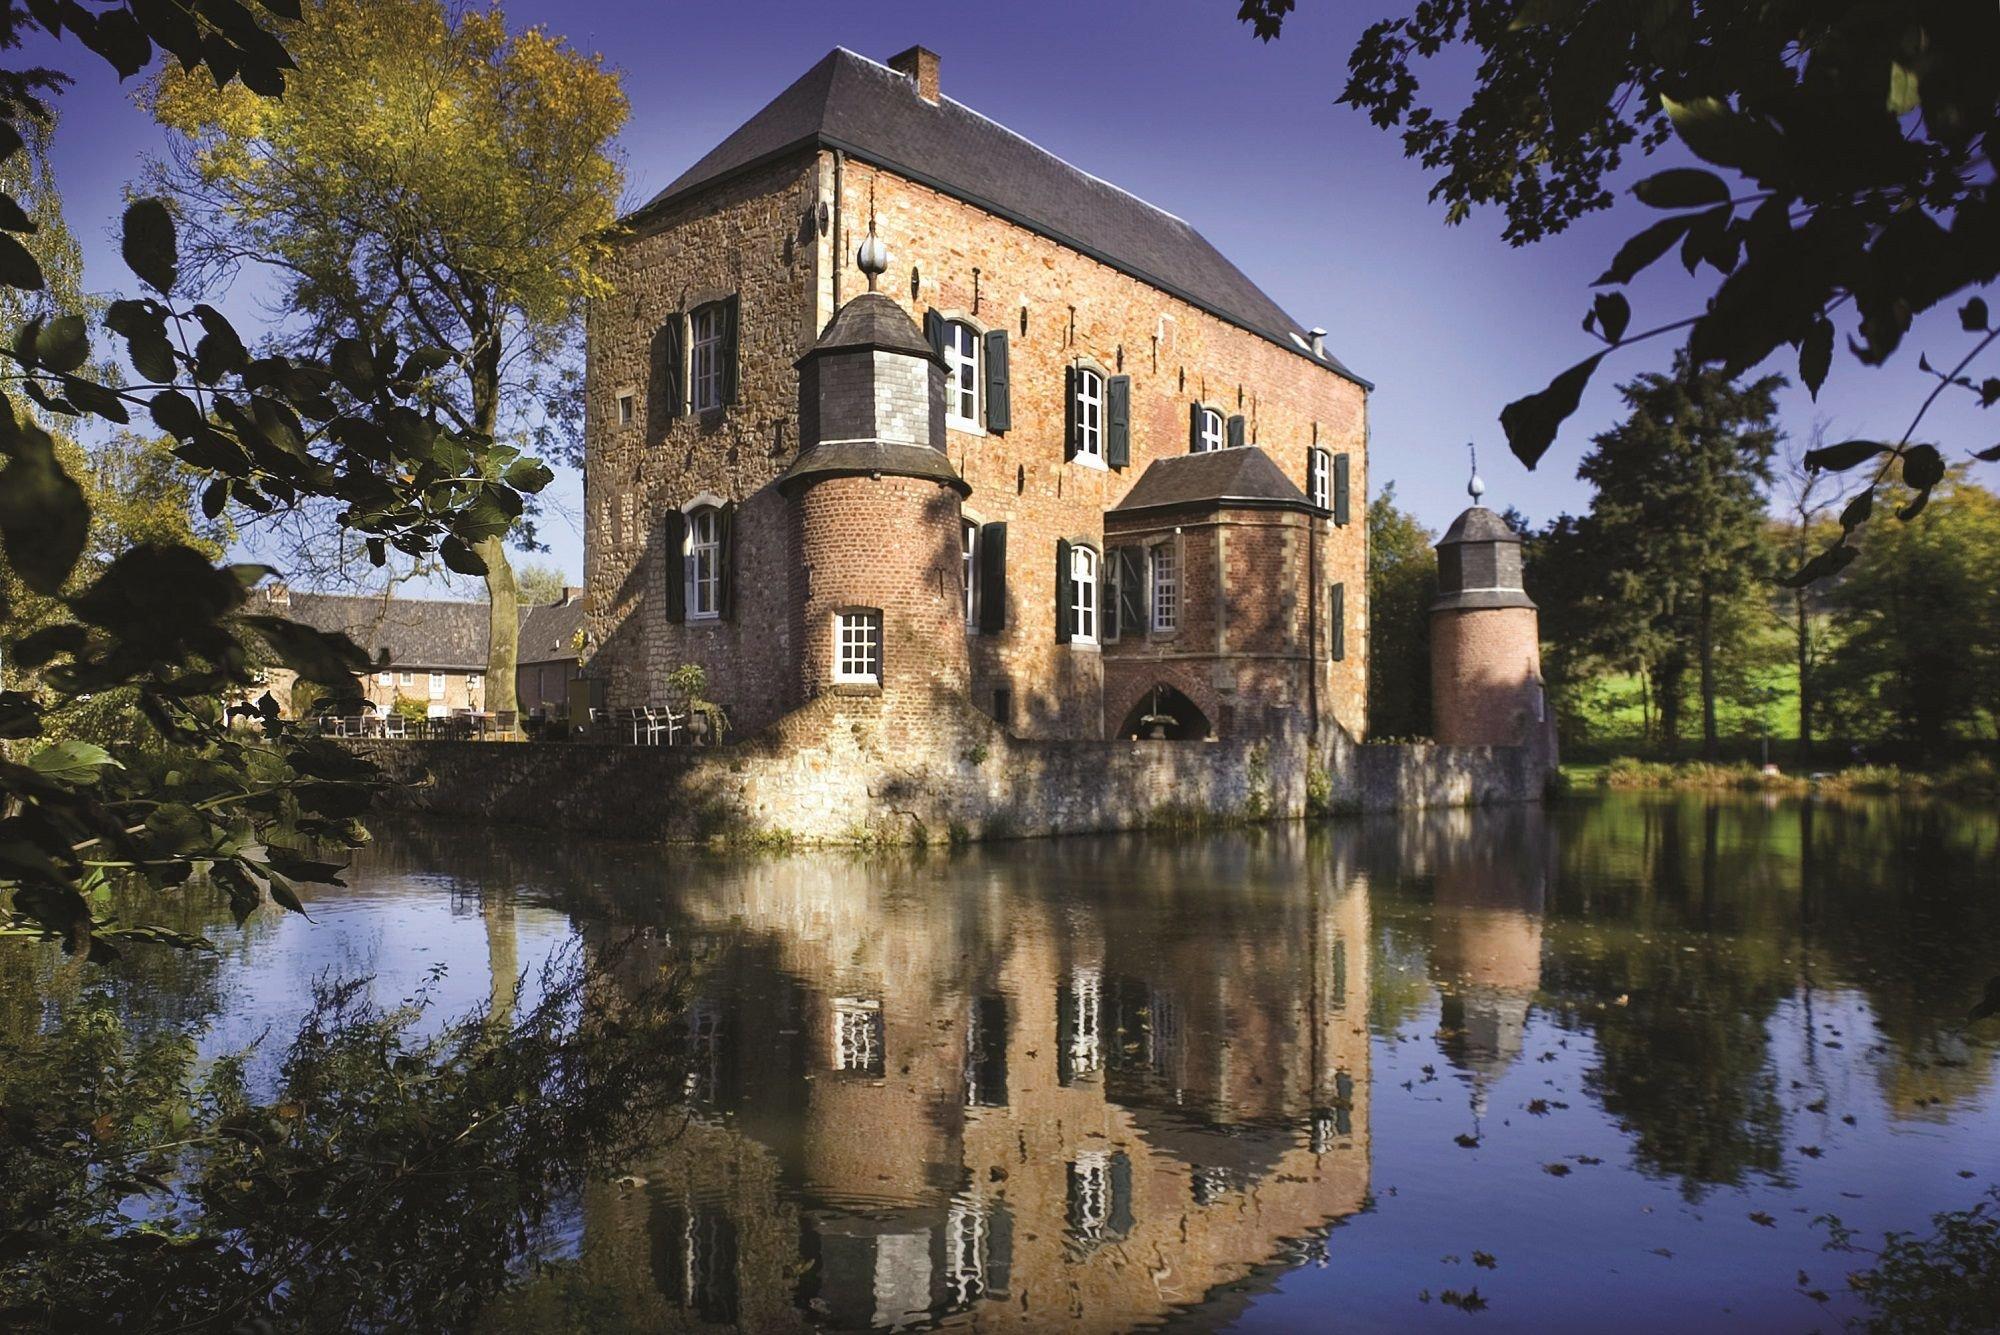 Dagaanbieding - 3 dagen 4*-kasteelhotel in Zuid-Limburg incl. ontbijt en 3-gangendiner dagelijkse koopjes